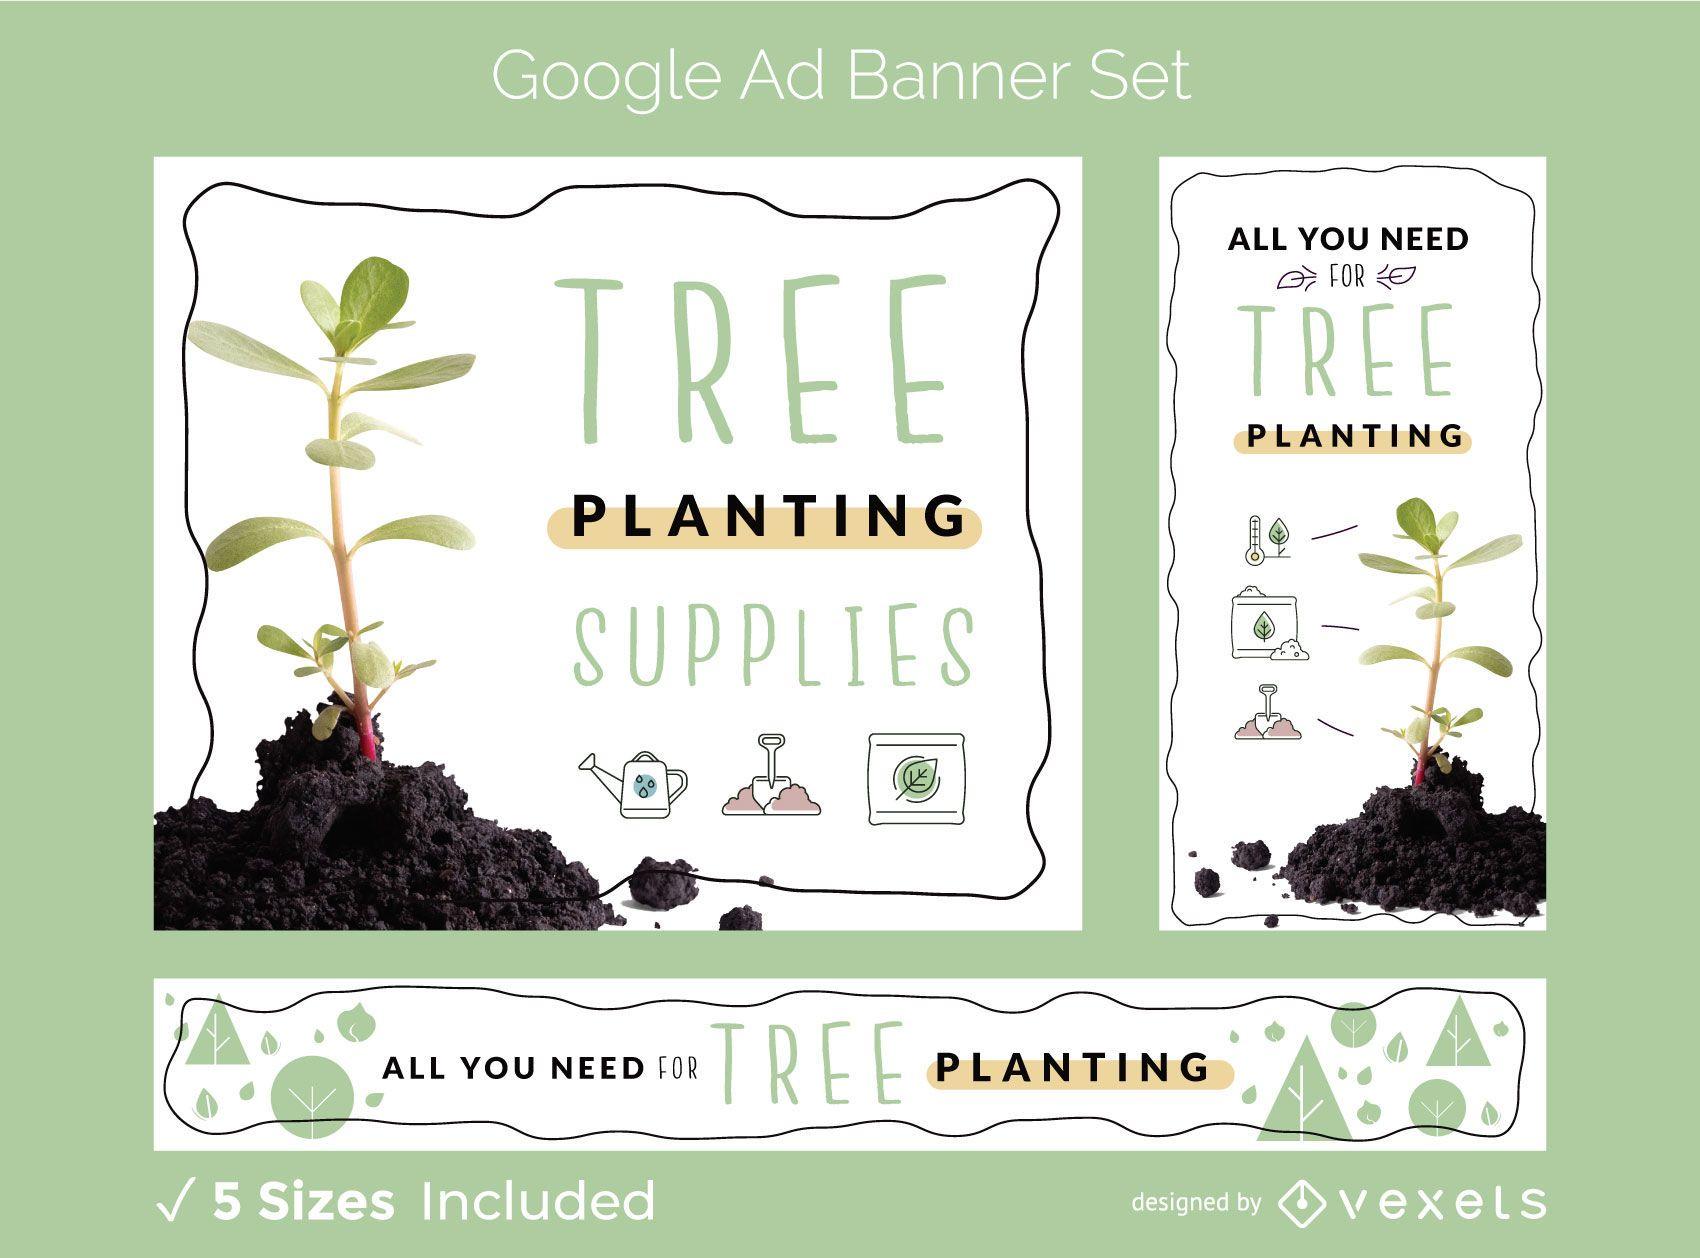 Tree planting ad banner set